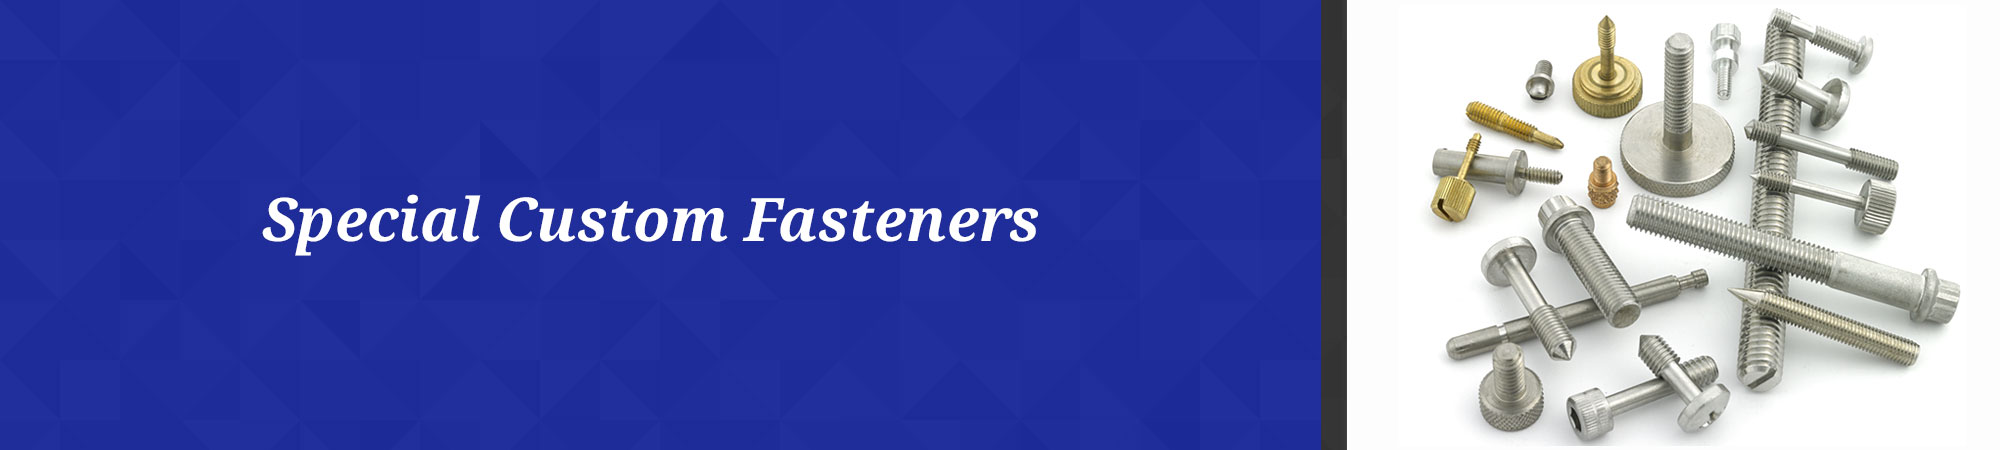 Special Custom Fasteners